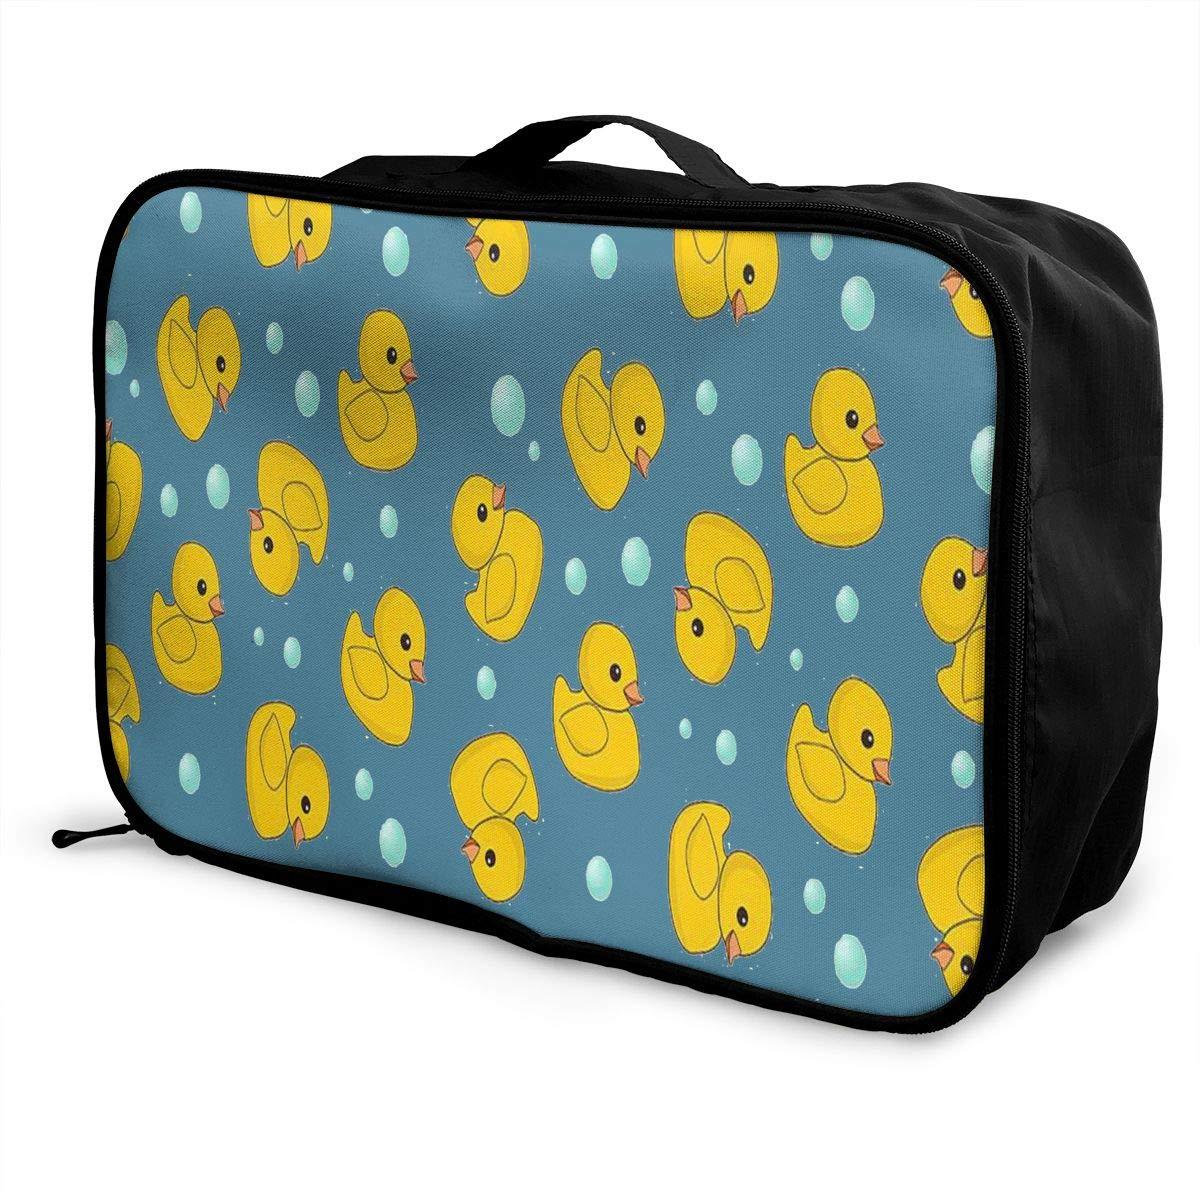 Lightweight Large Capacity Duffel Portable Luggage Bag Fun Ducks Travel Waterproof Foldable Storage Carry Tote Bag